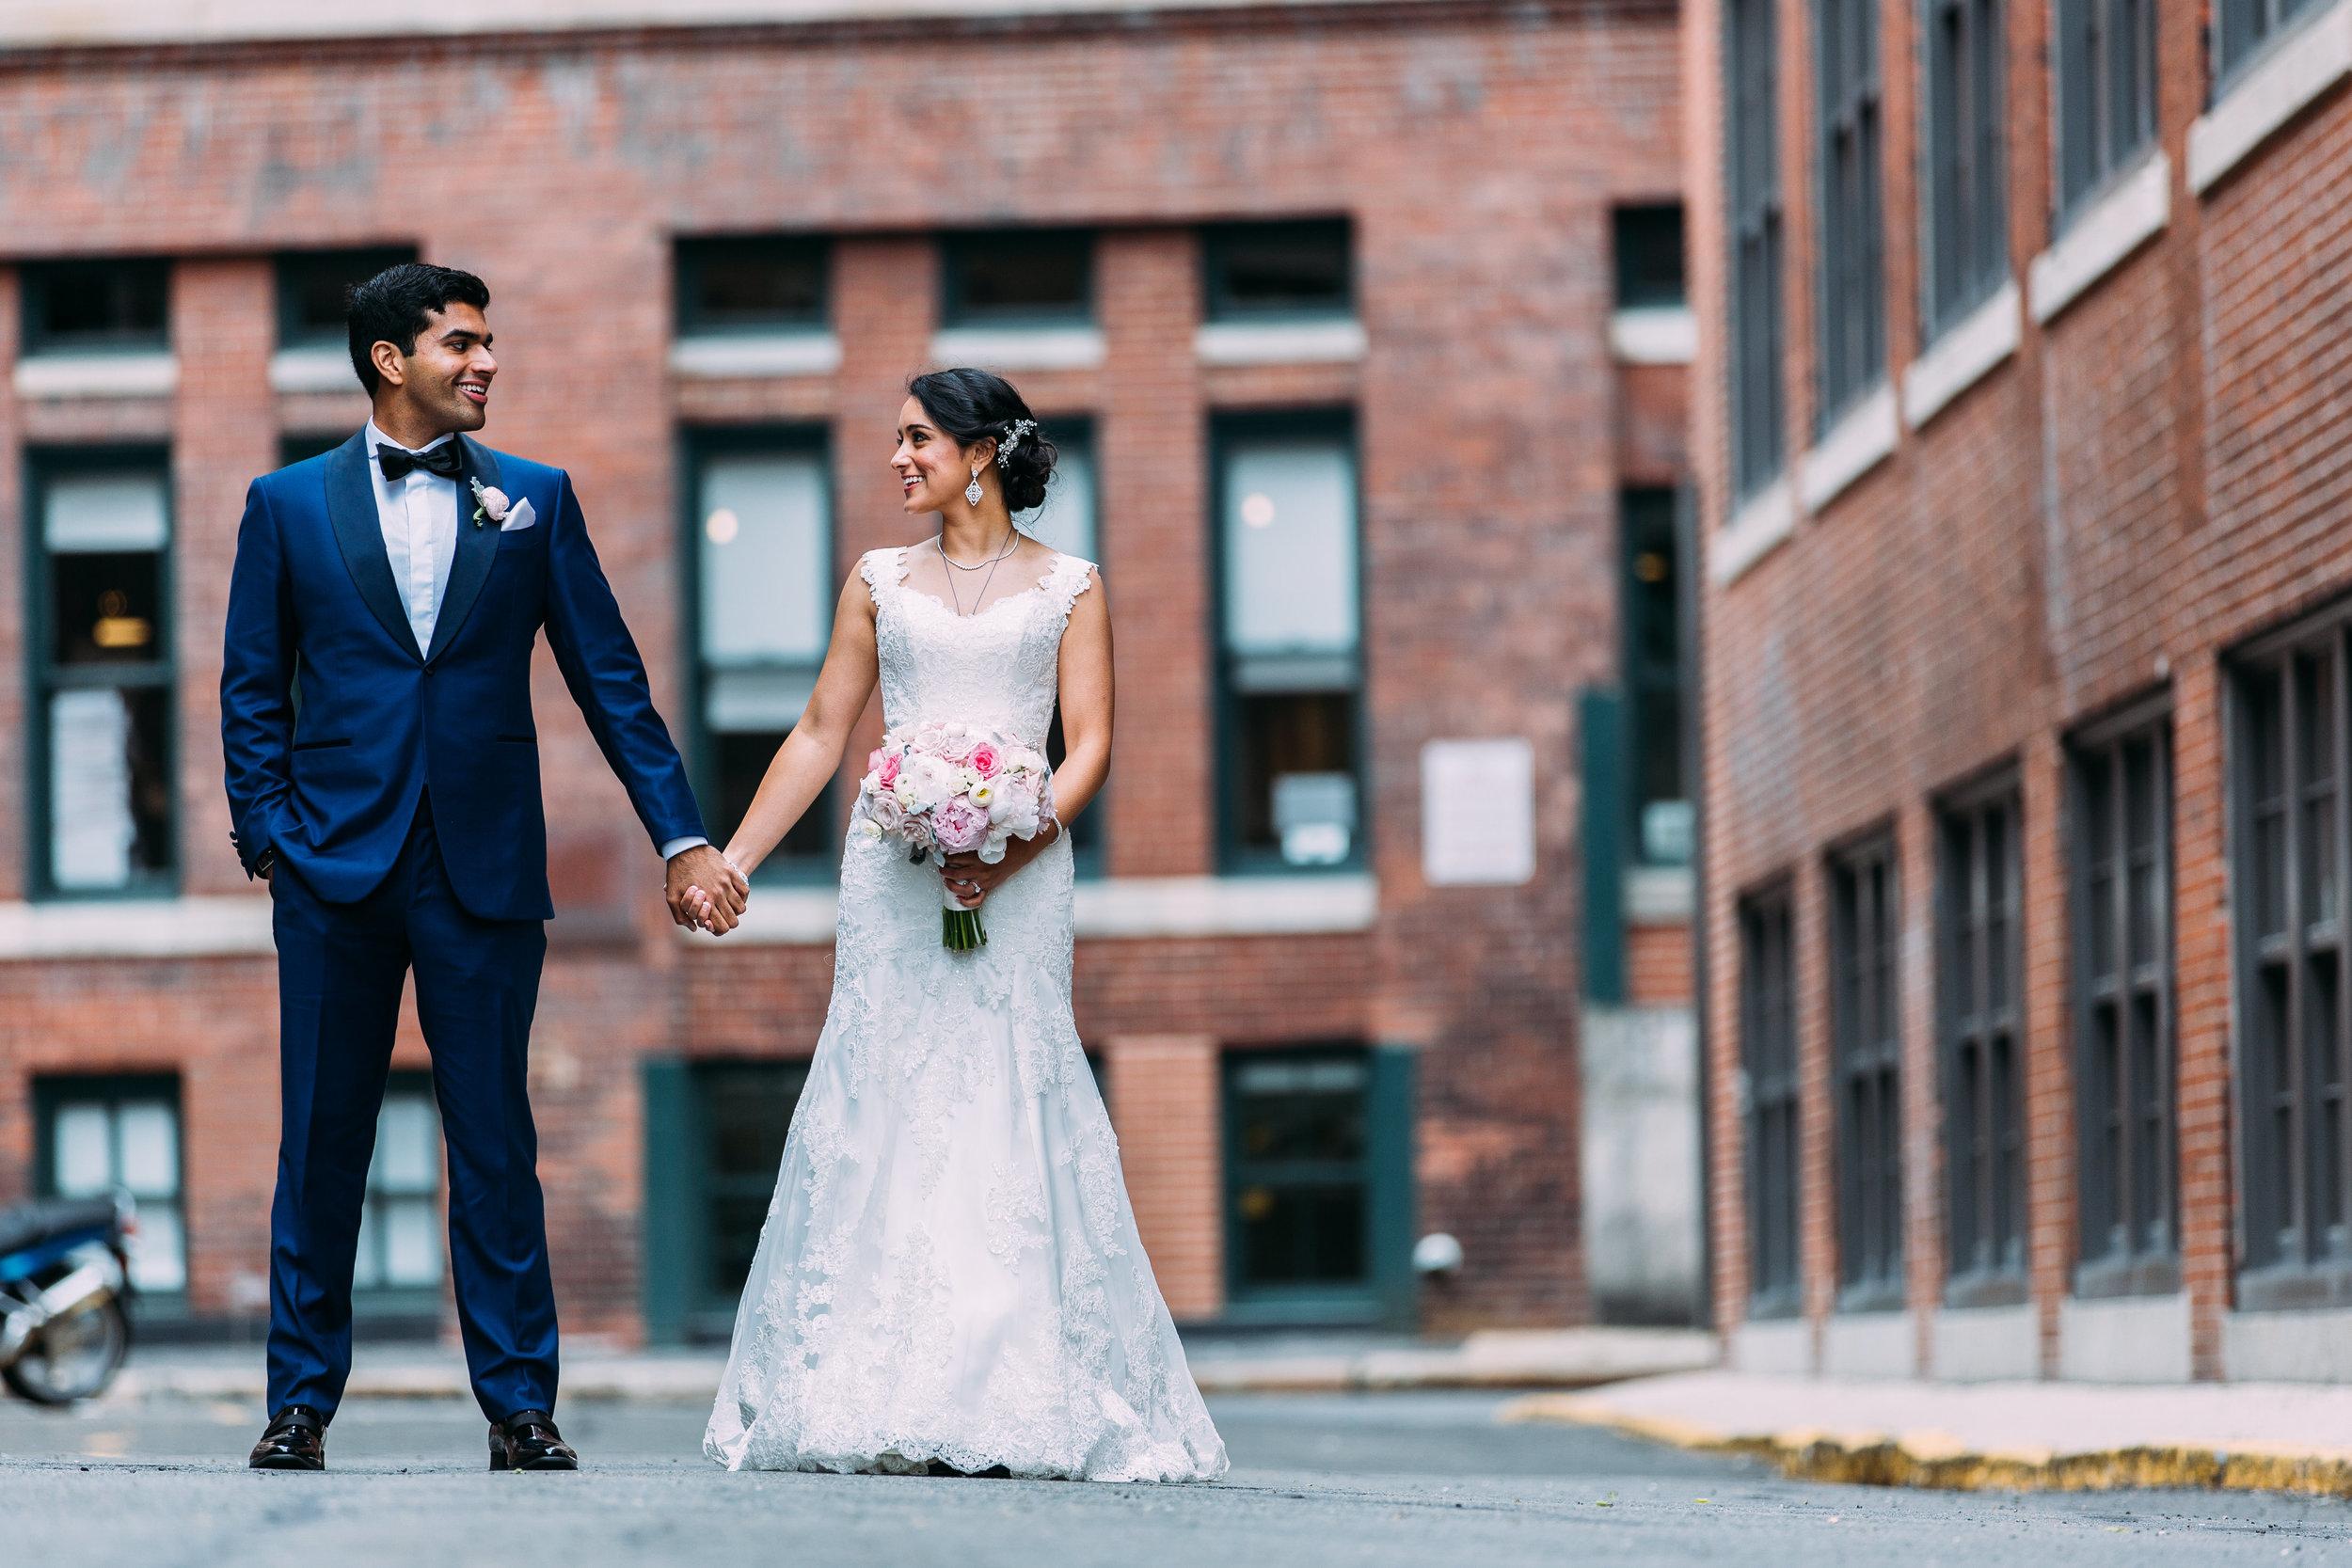 Anitajacob_Wedding_previews-76.jpg